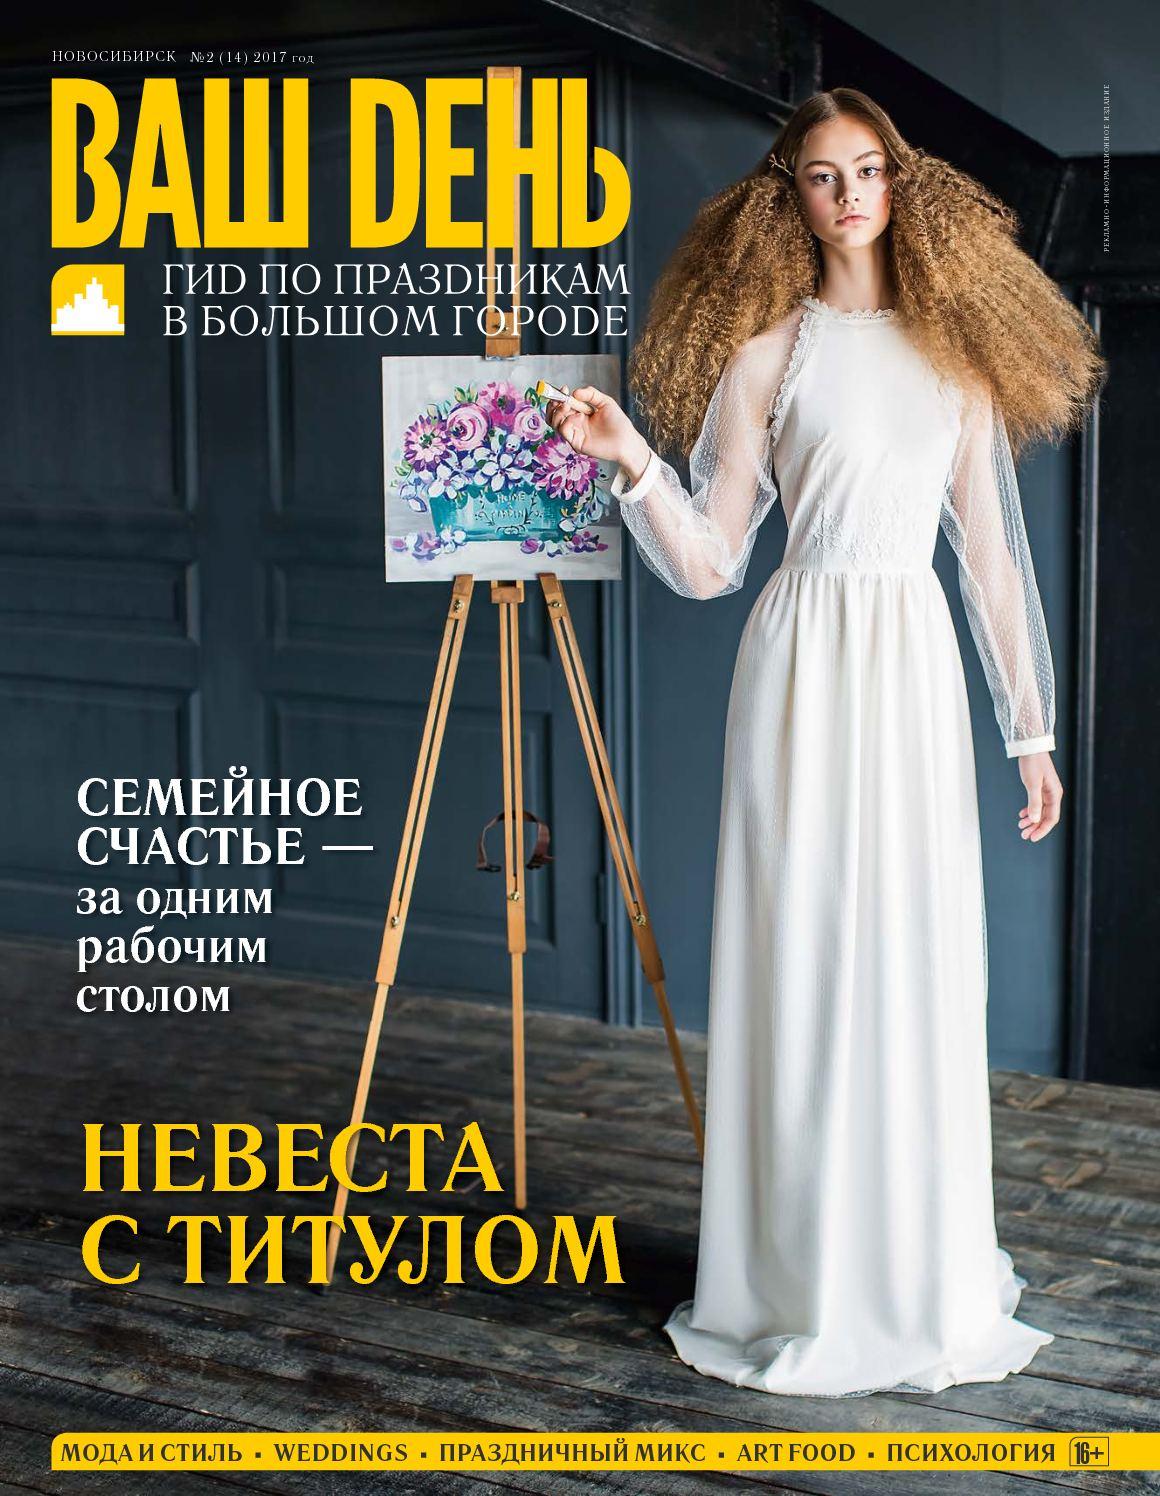 Журнал Ваш Dень № 2 за 2017